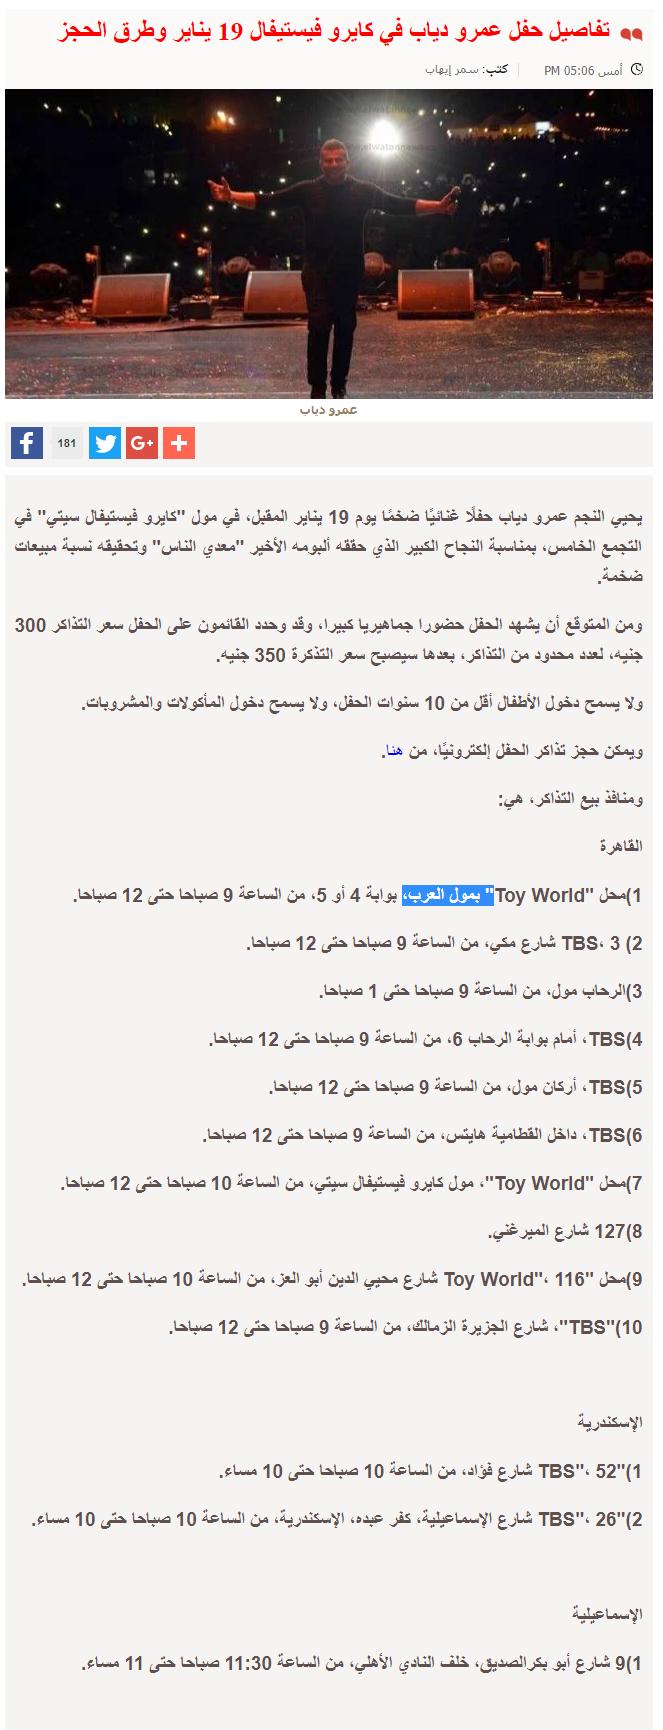 FireShot Capture 765 - الوطن I تفاصيل حفل عمرو د_ - https___www.elwatannews.com_news_details_2875190.png